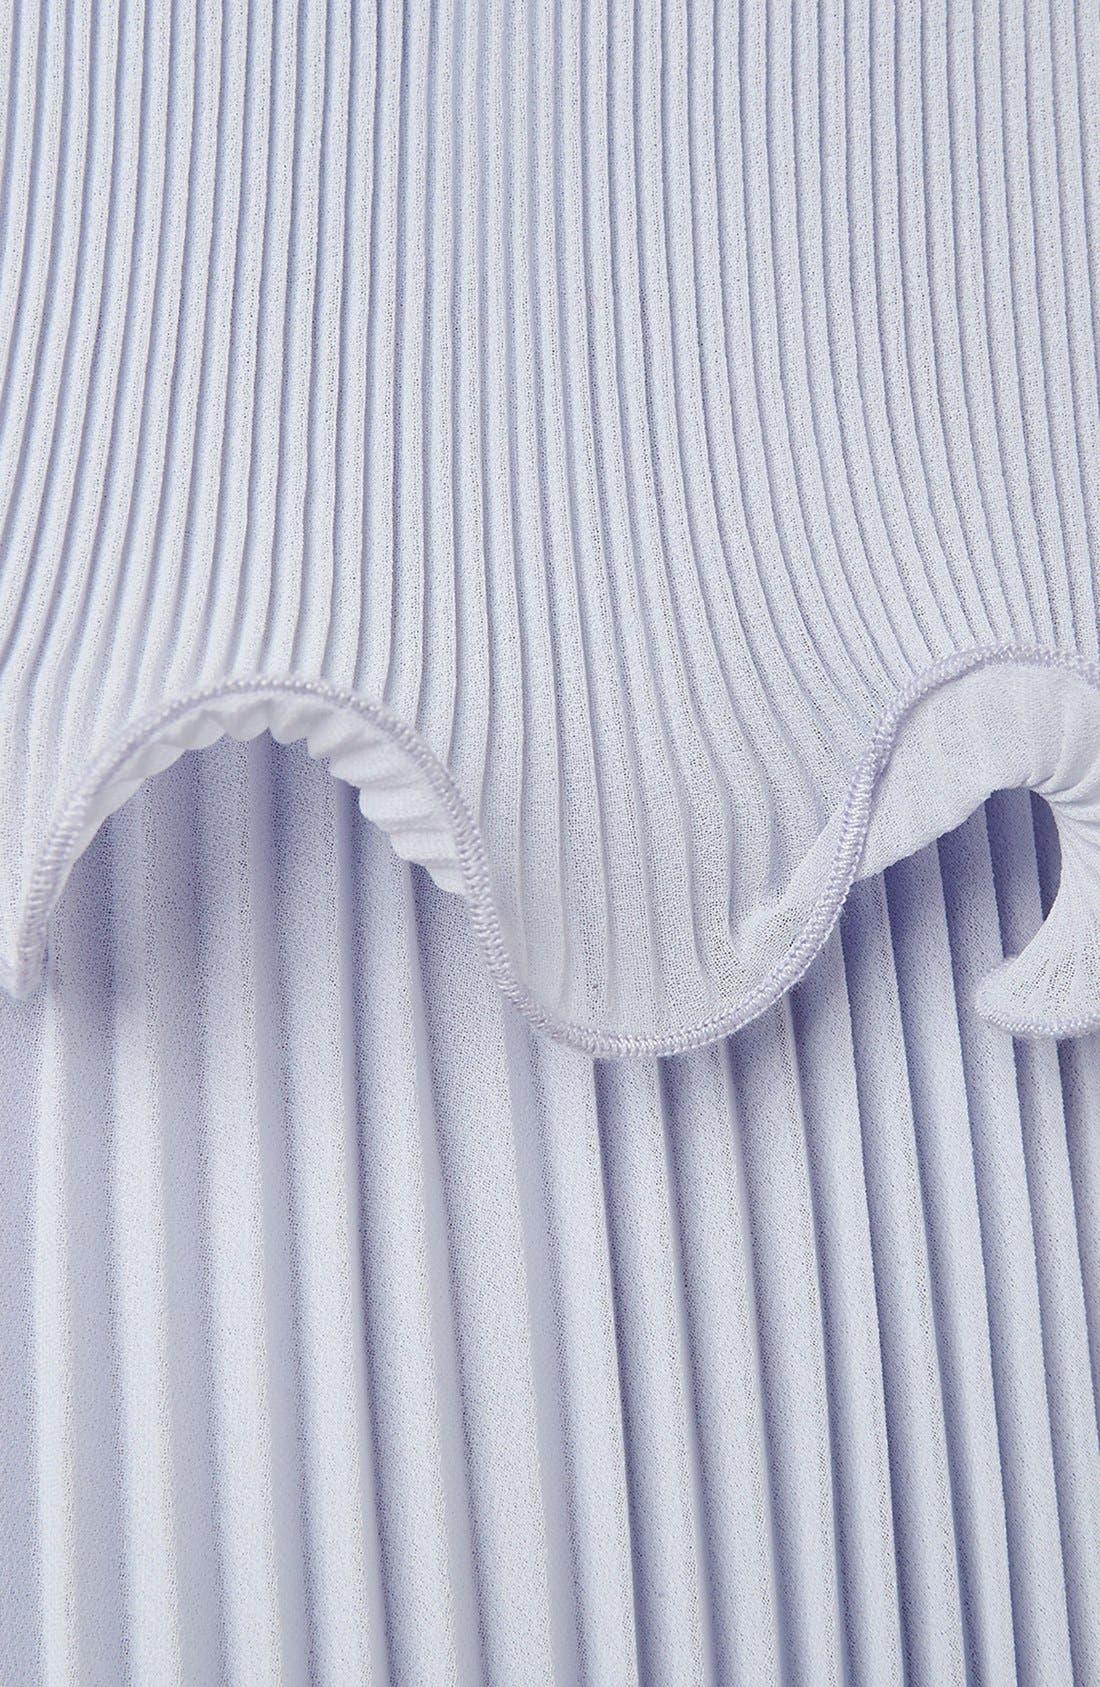 Alternate Image 2  - ERIN erin fetherston 'Mattie' Pleated Chiffon Slip Dress